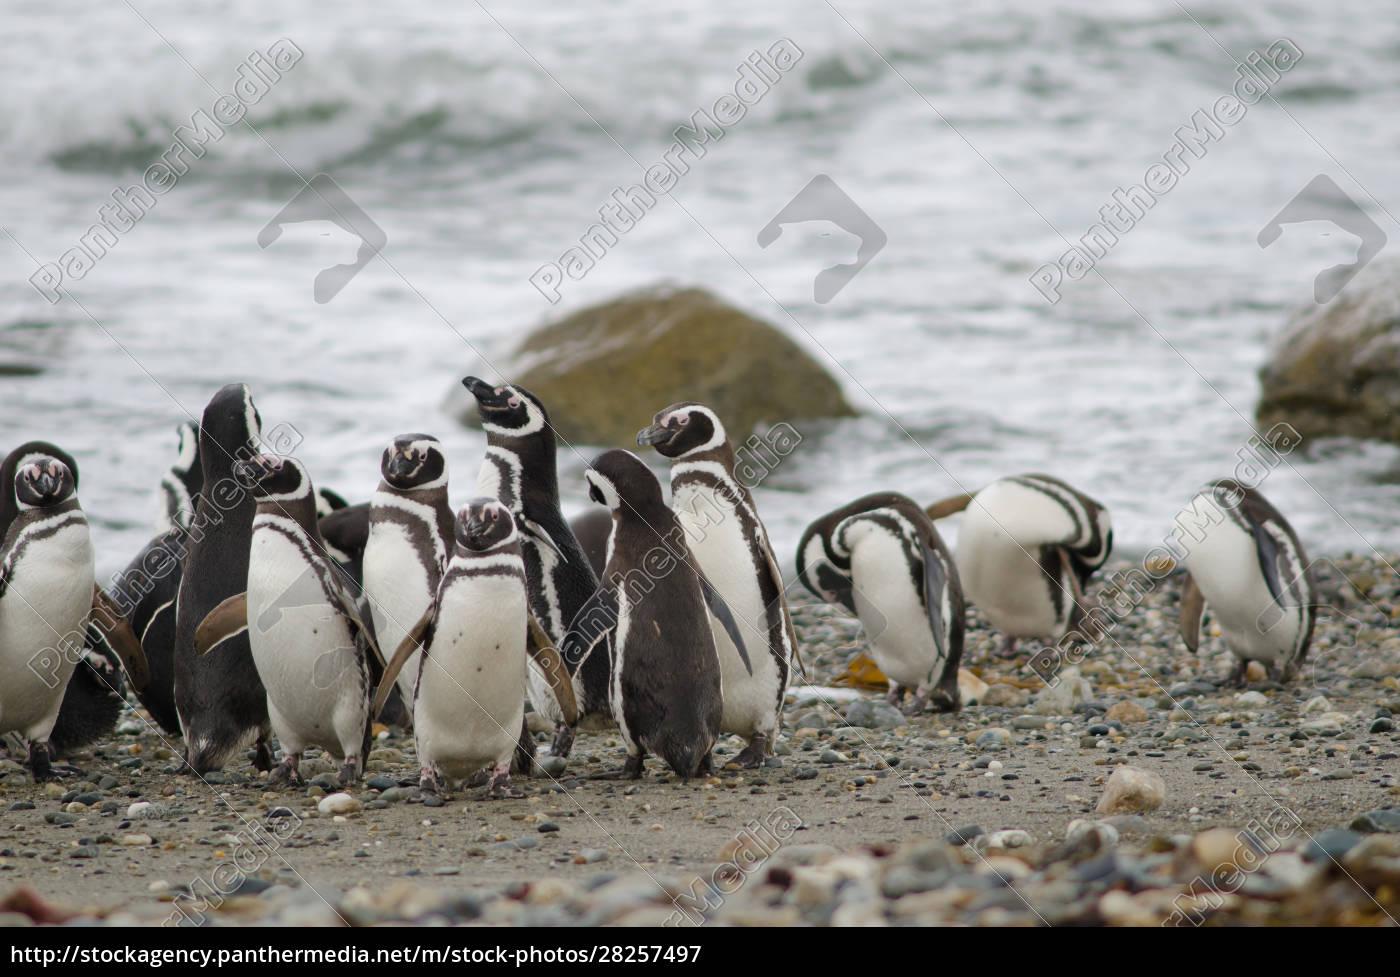 magellanic, penguins, in, the, otway, sound - 28257497